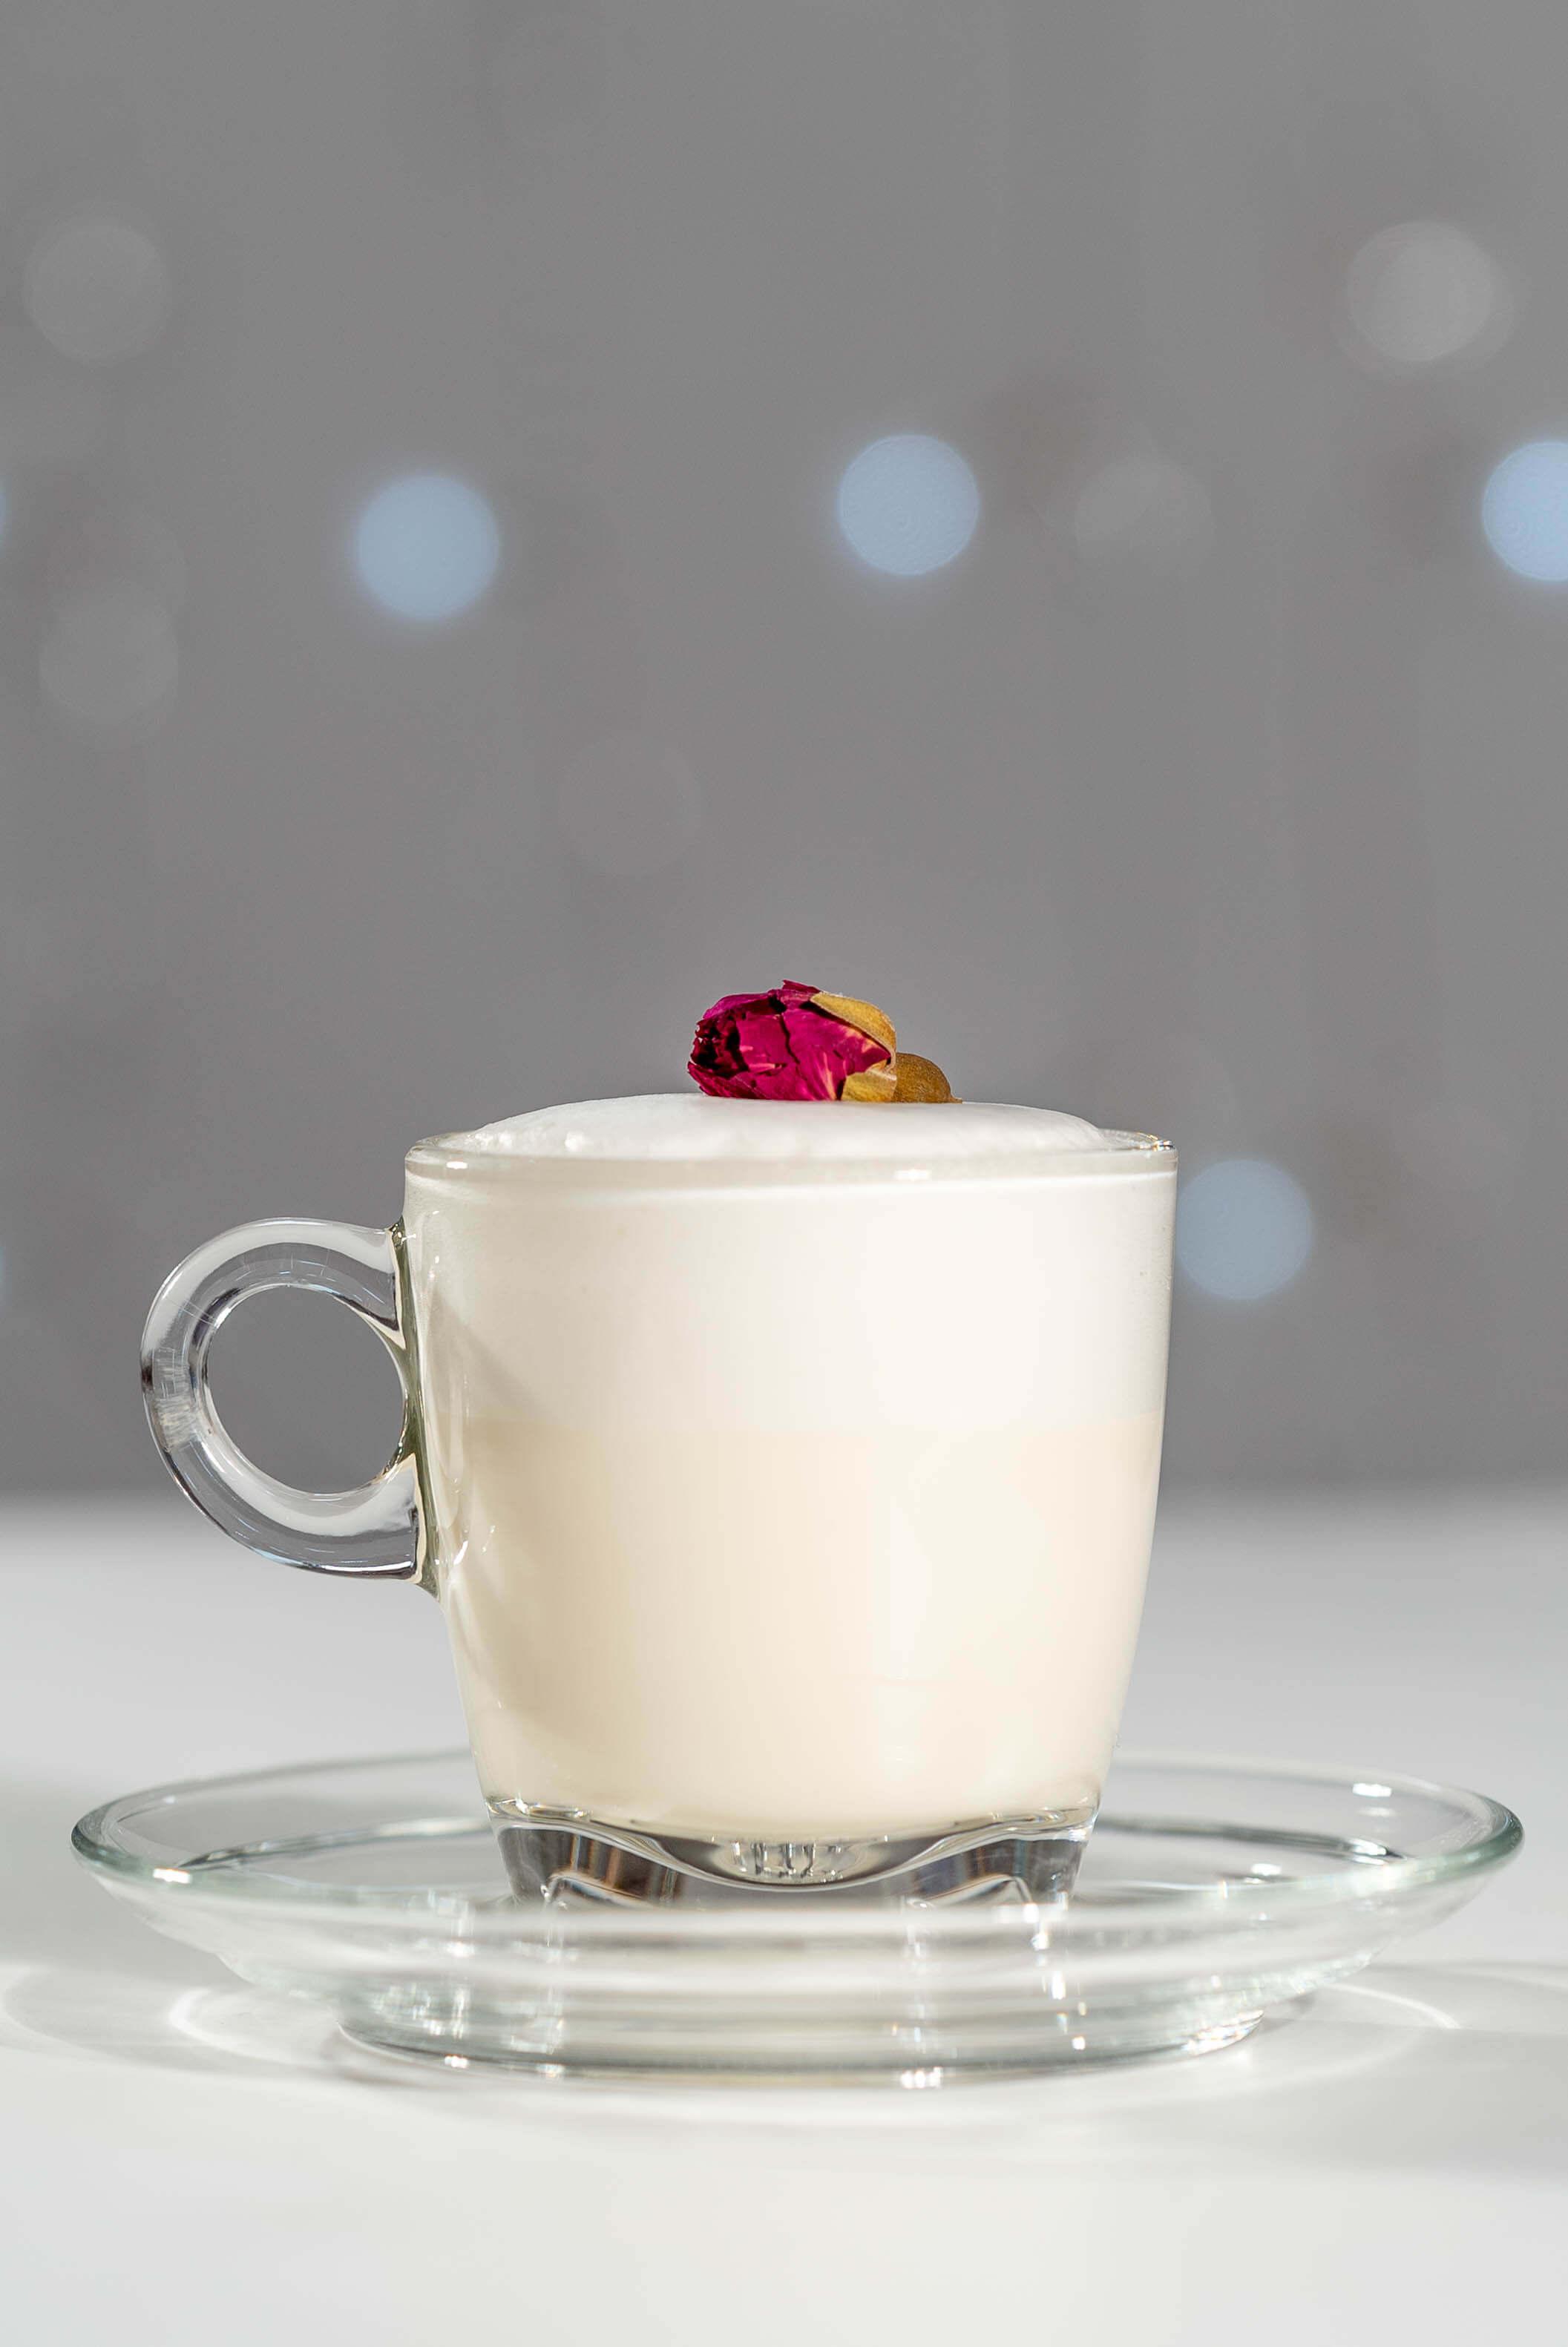 BEV088 - Rose White Hot Chocolate